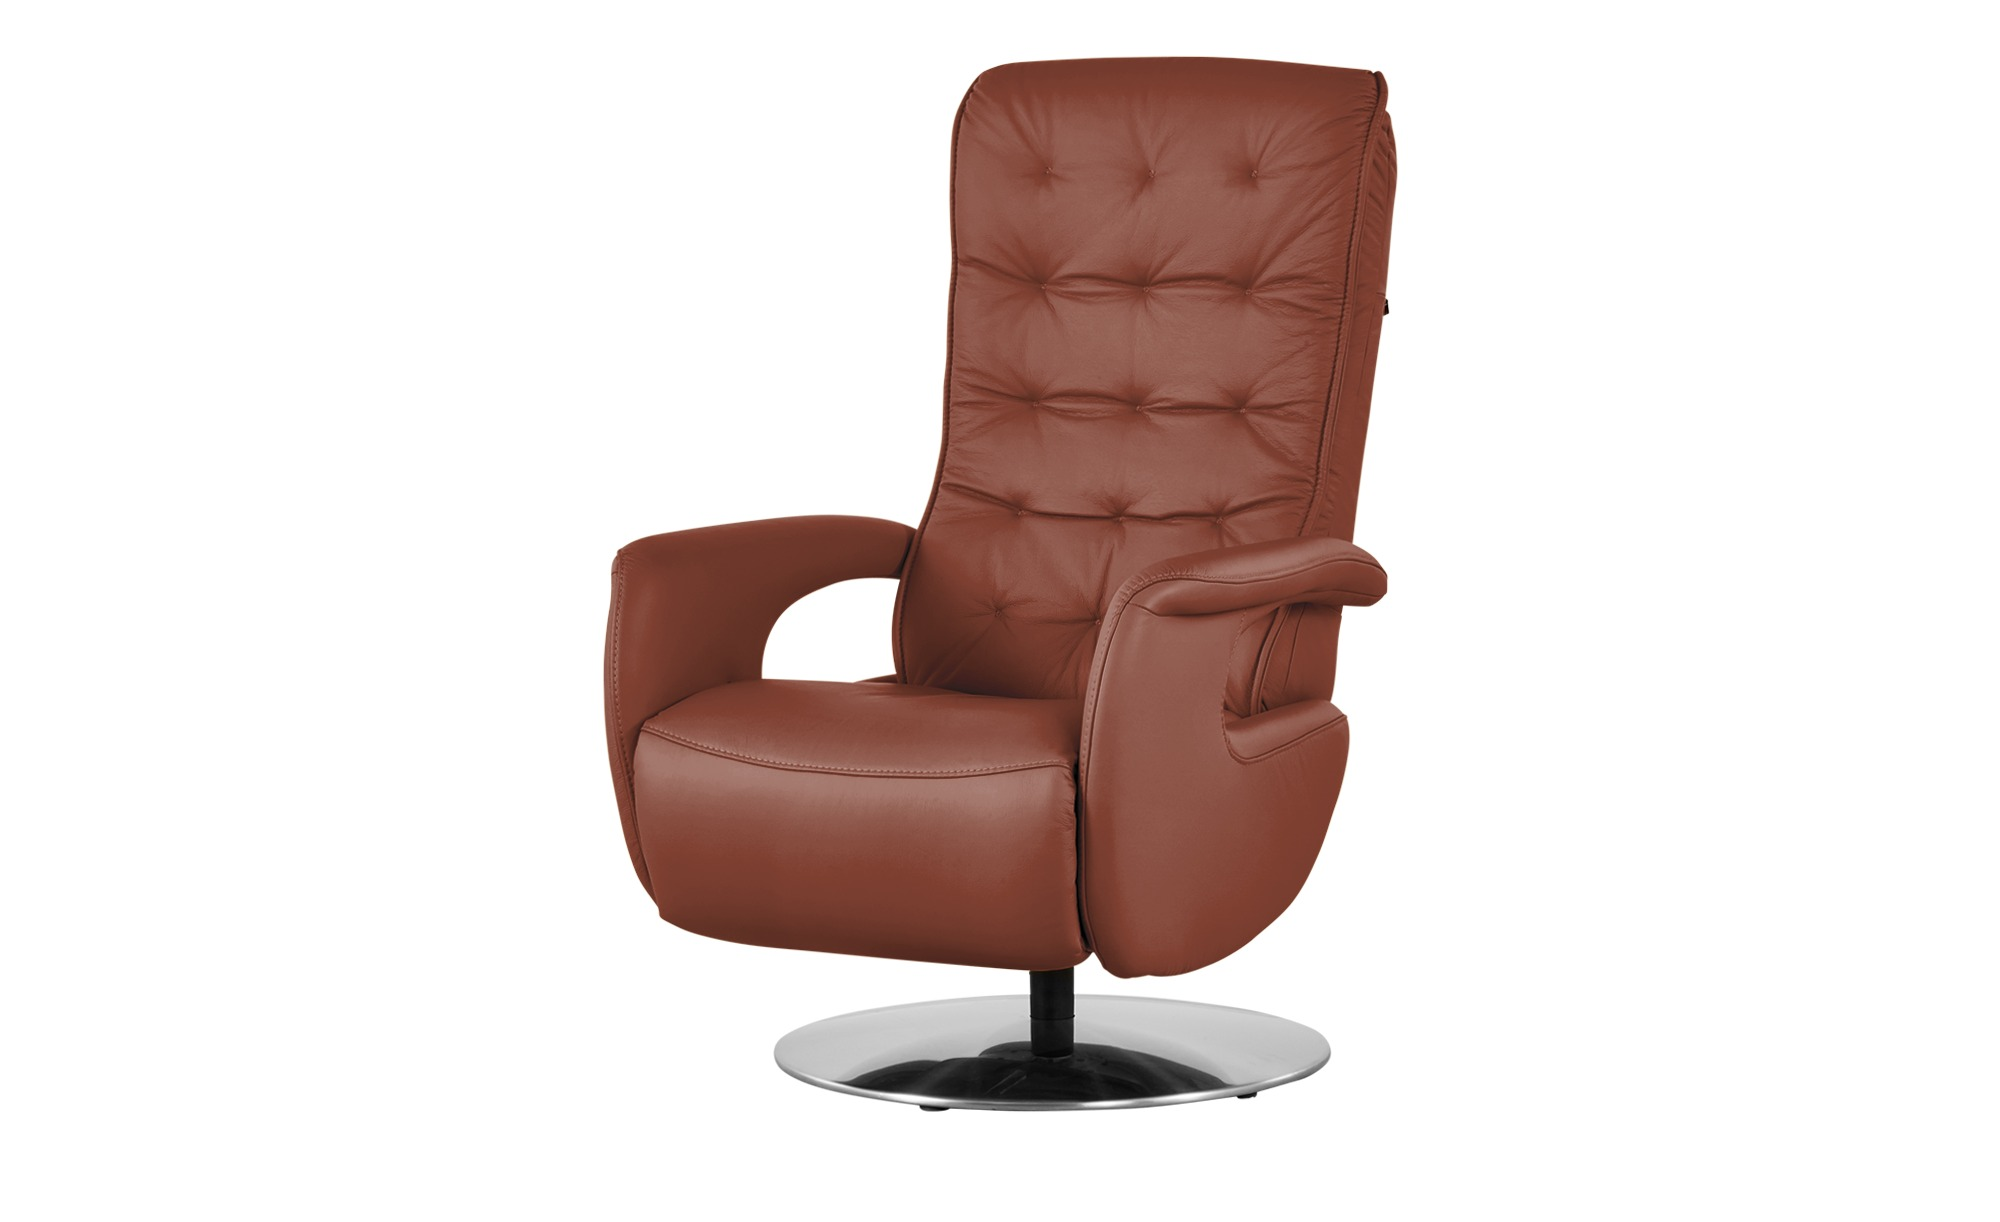 Hukla Relaxsessel  Smilla ¦ braun ¦ Maße (cm): B: 72 H: 113 T: 83 Polstermöbel > Sessel > Ledersessel - Höffner